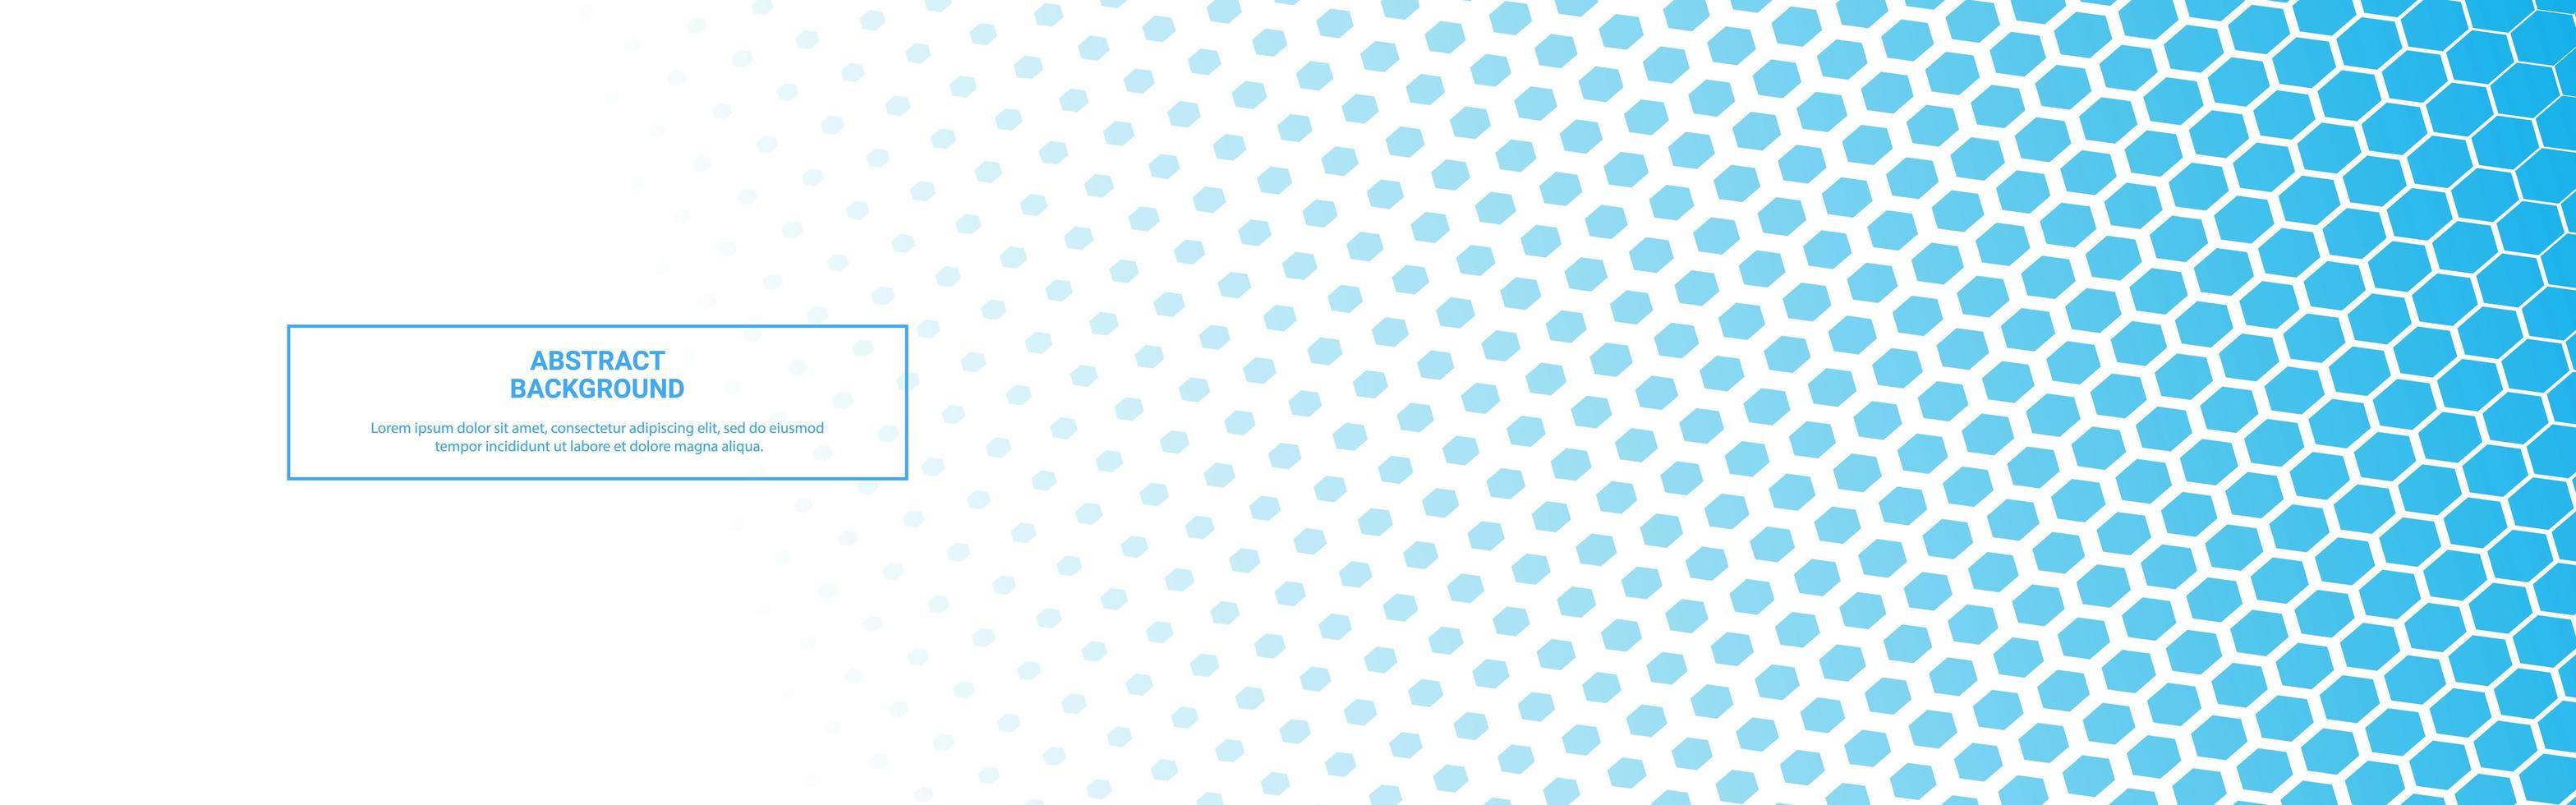 trama geometrica sfumata blu mezzitoni vettore